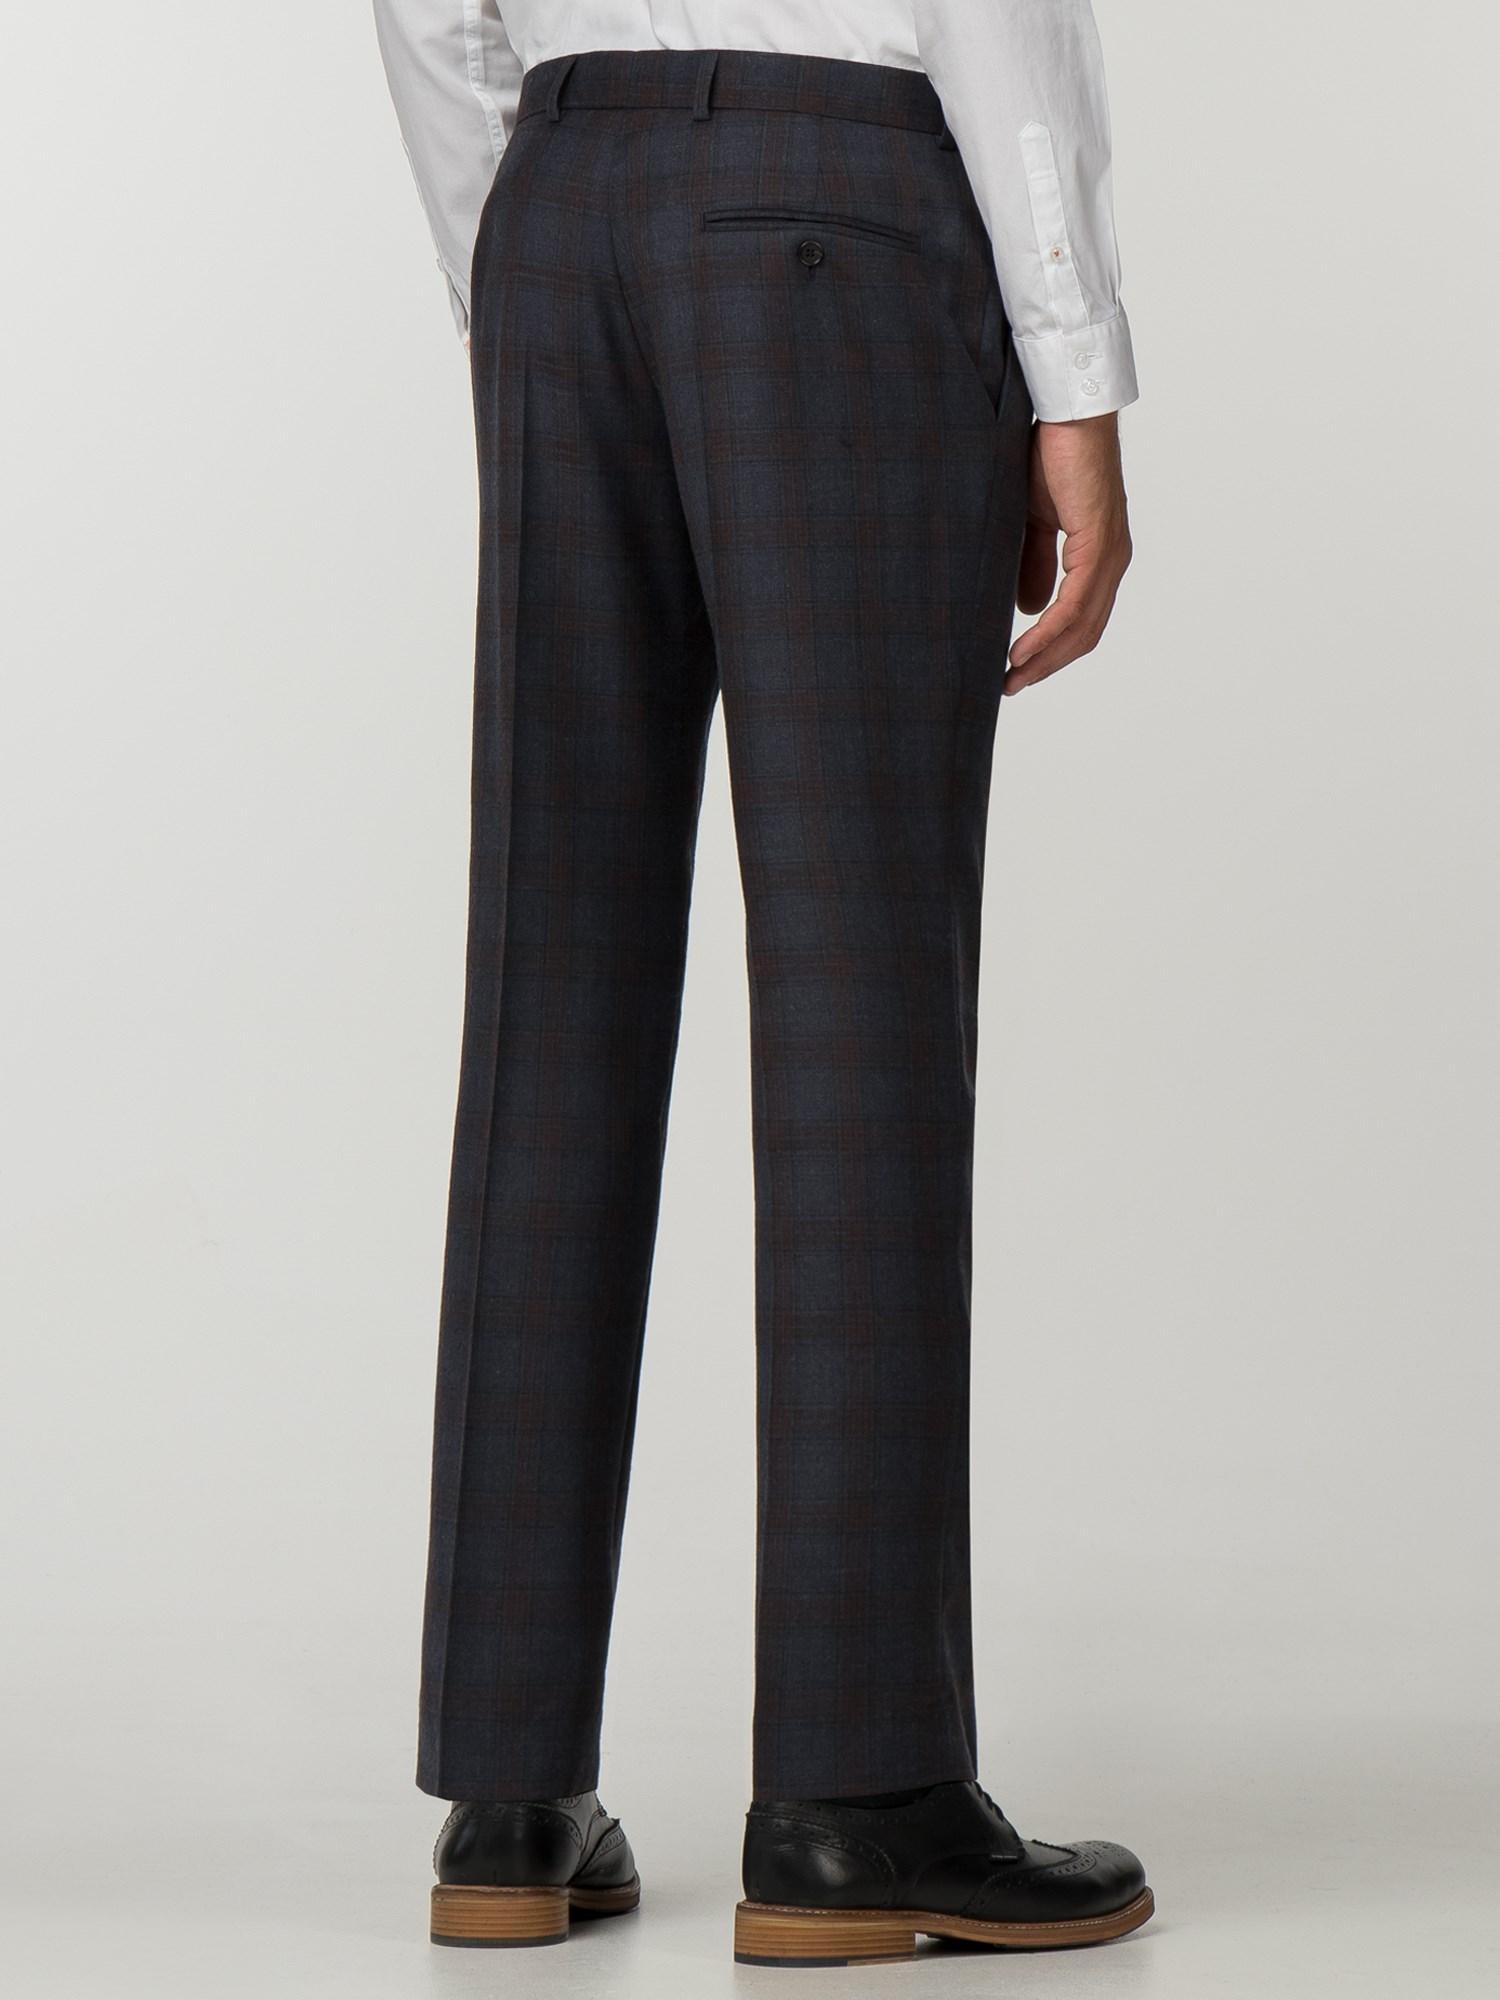 Navy Rust Check Slim Fit Suit Trouser